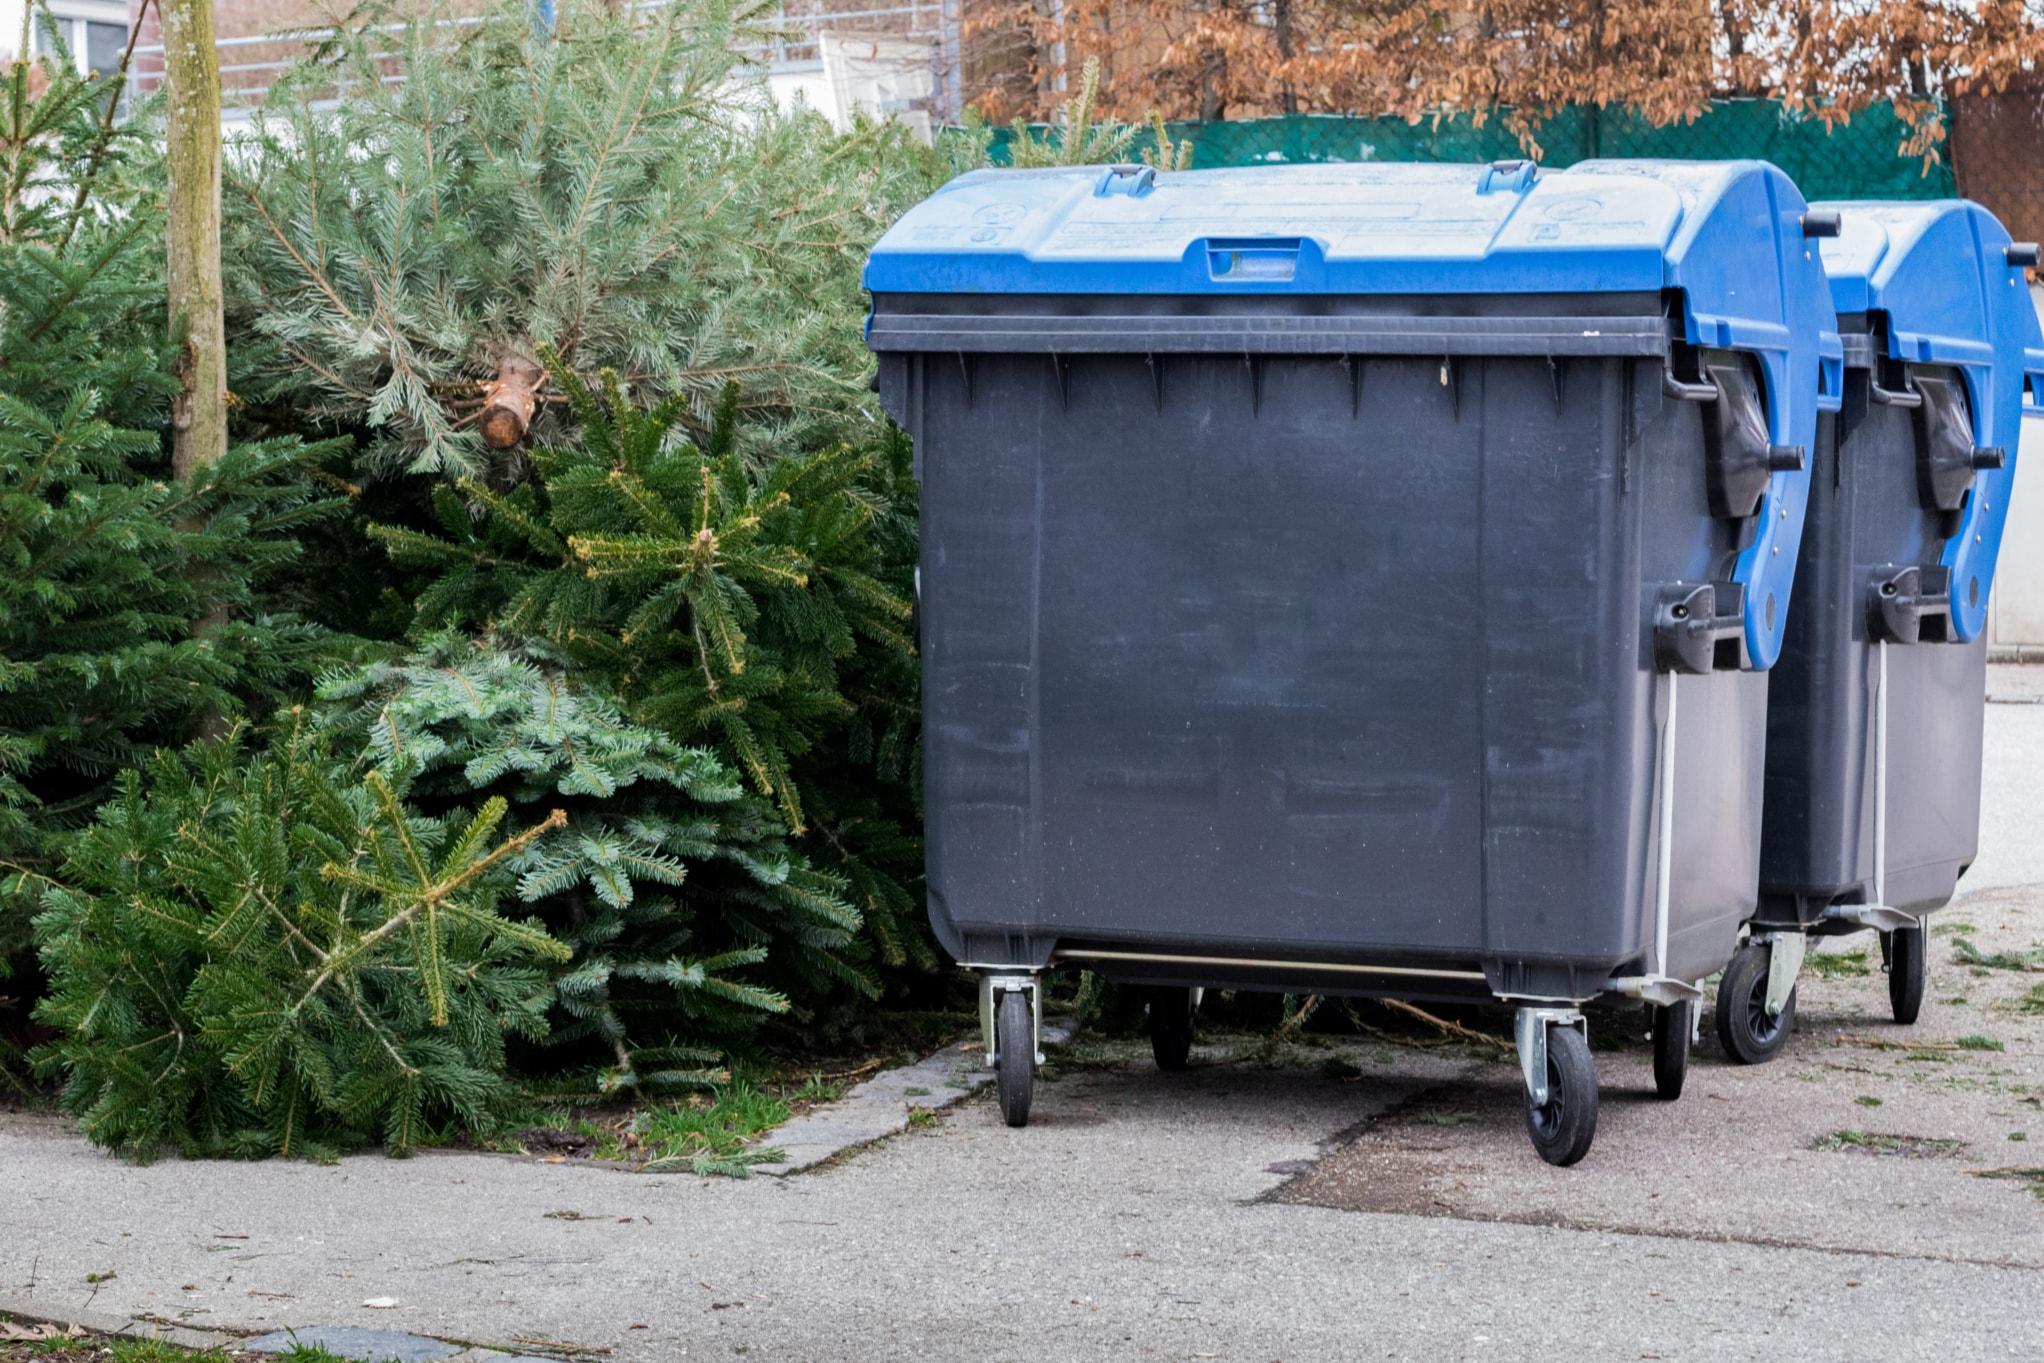 Christmas, Christmas Trees, Recycle, Recycling Bin